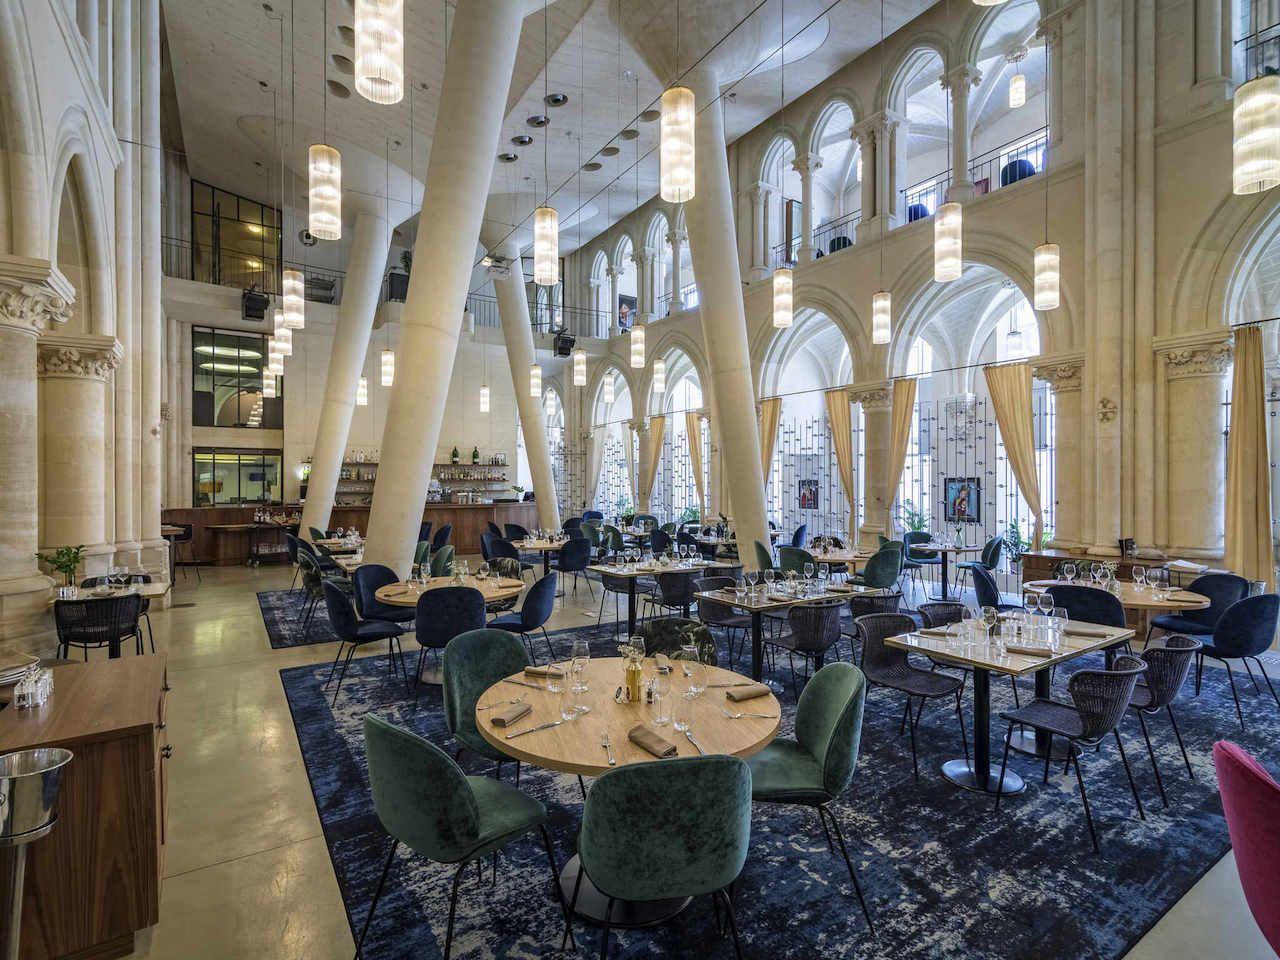 Mercure Poitiers Centre Hotel restaurant